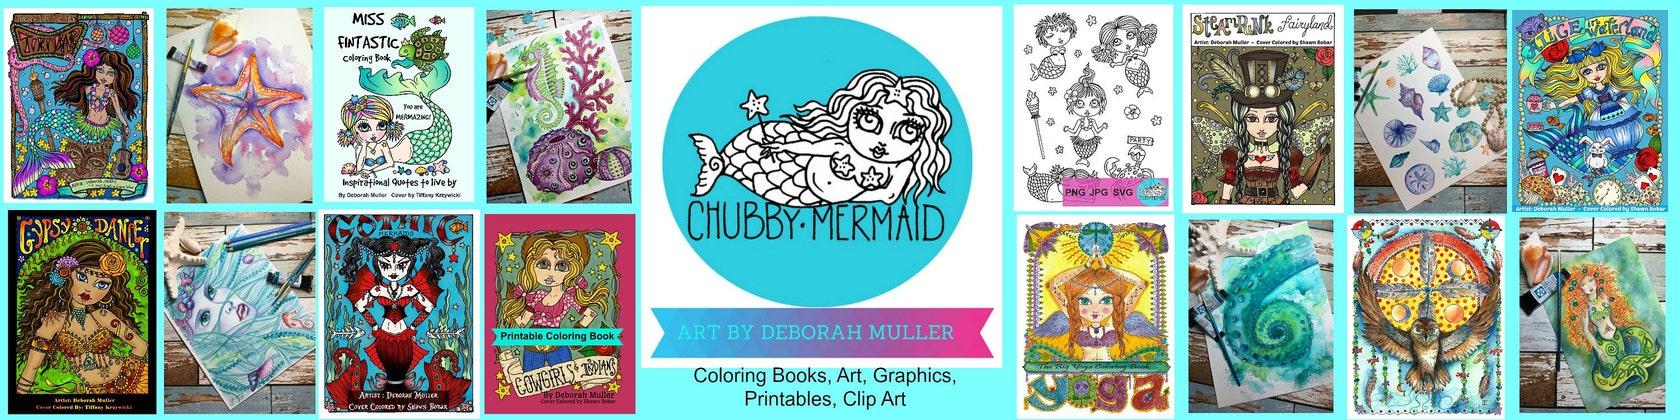 ChubbyMermaid FUN COLORING BOOKS